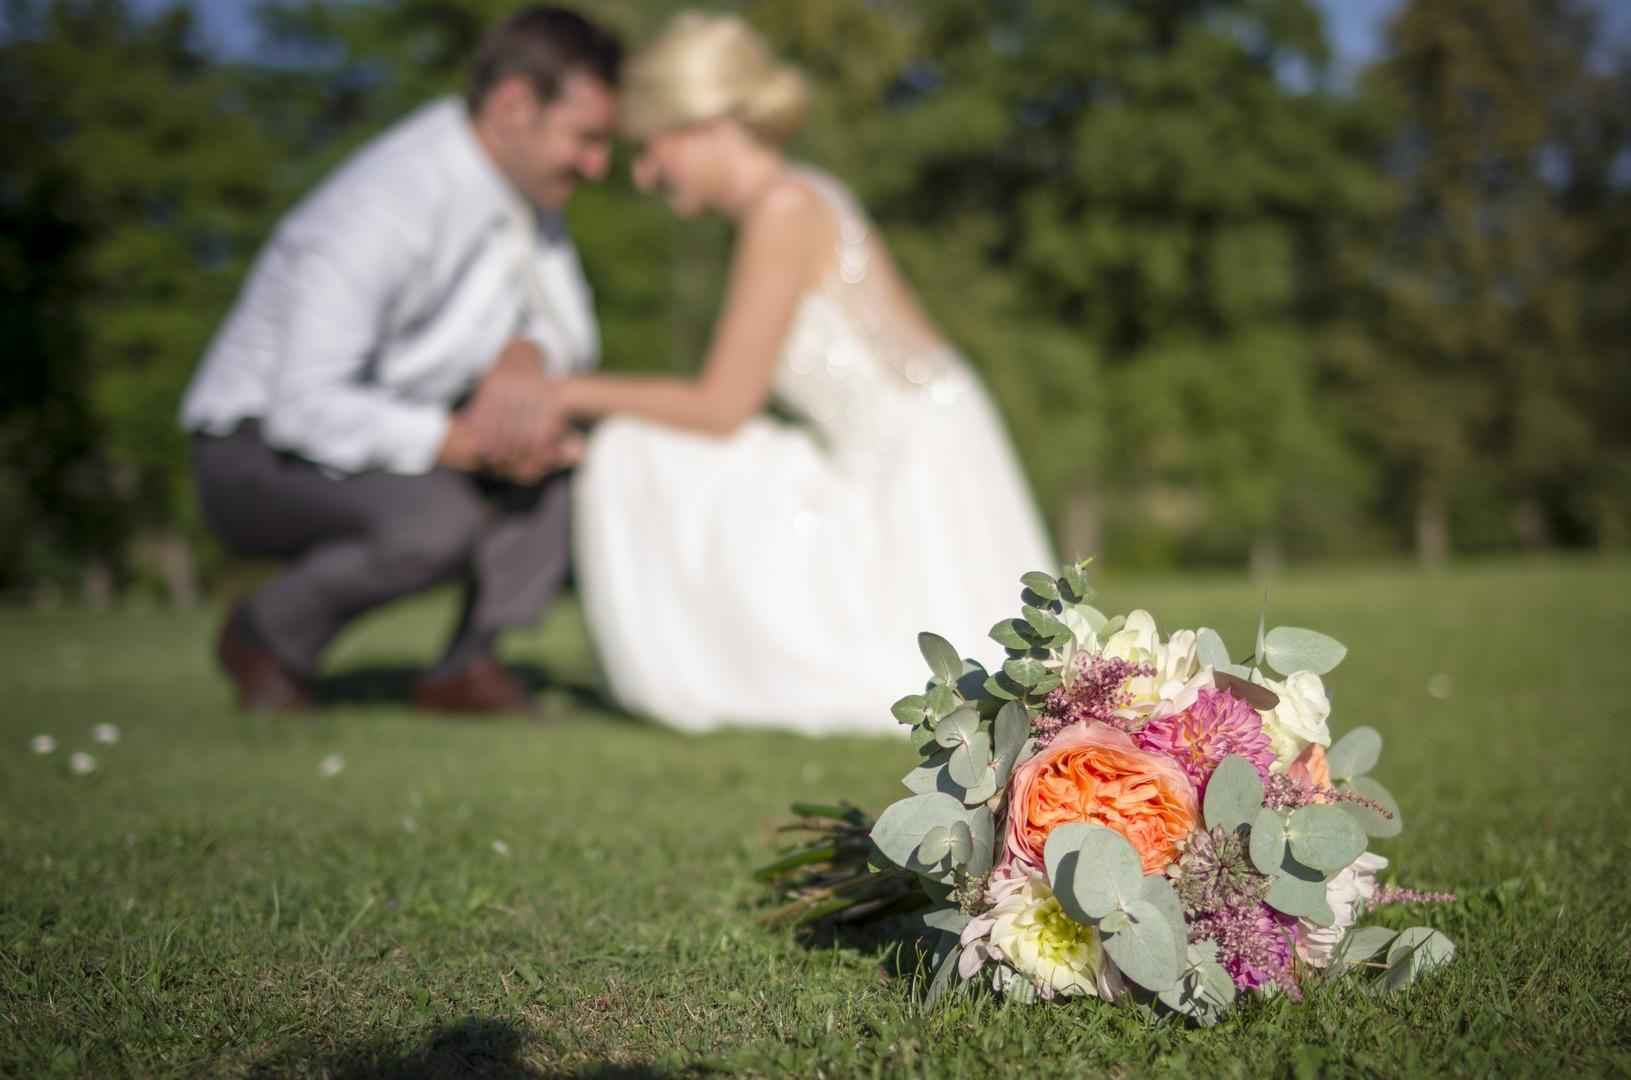 Wedding; photographing weddings; bride; groom; svatba; focení svateb; nevěsta; ženich